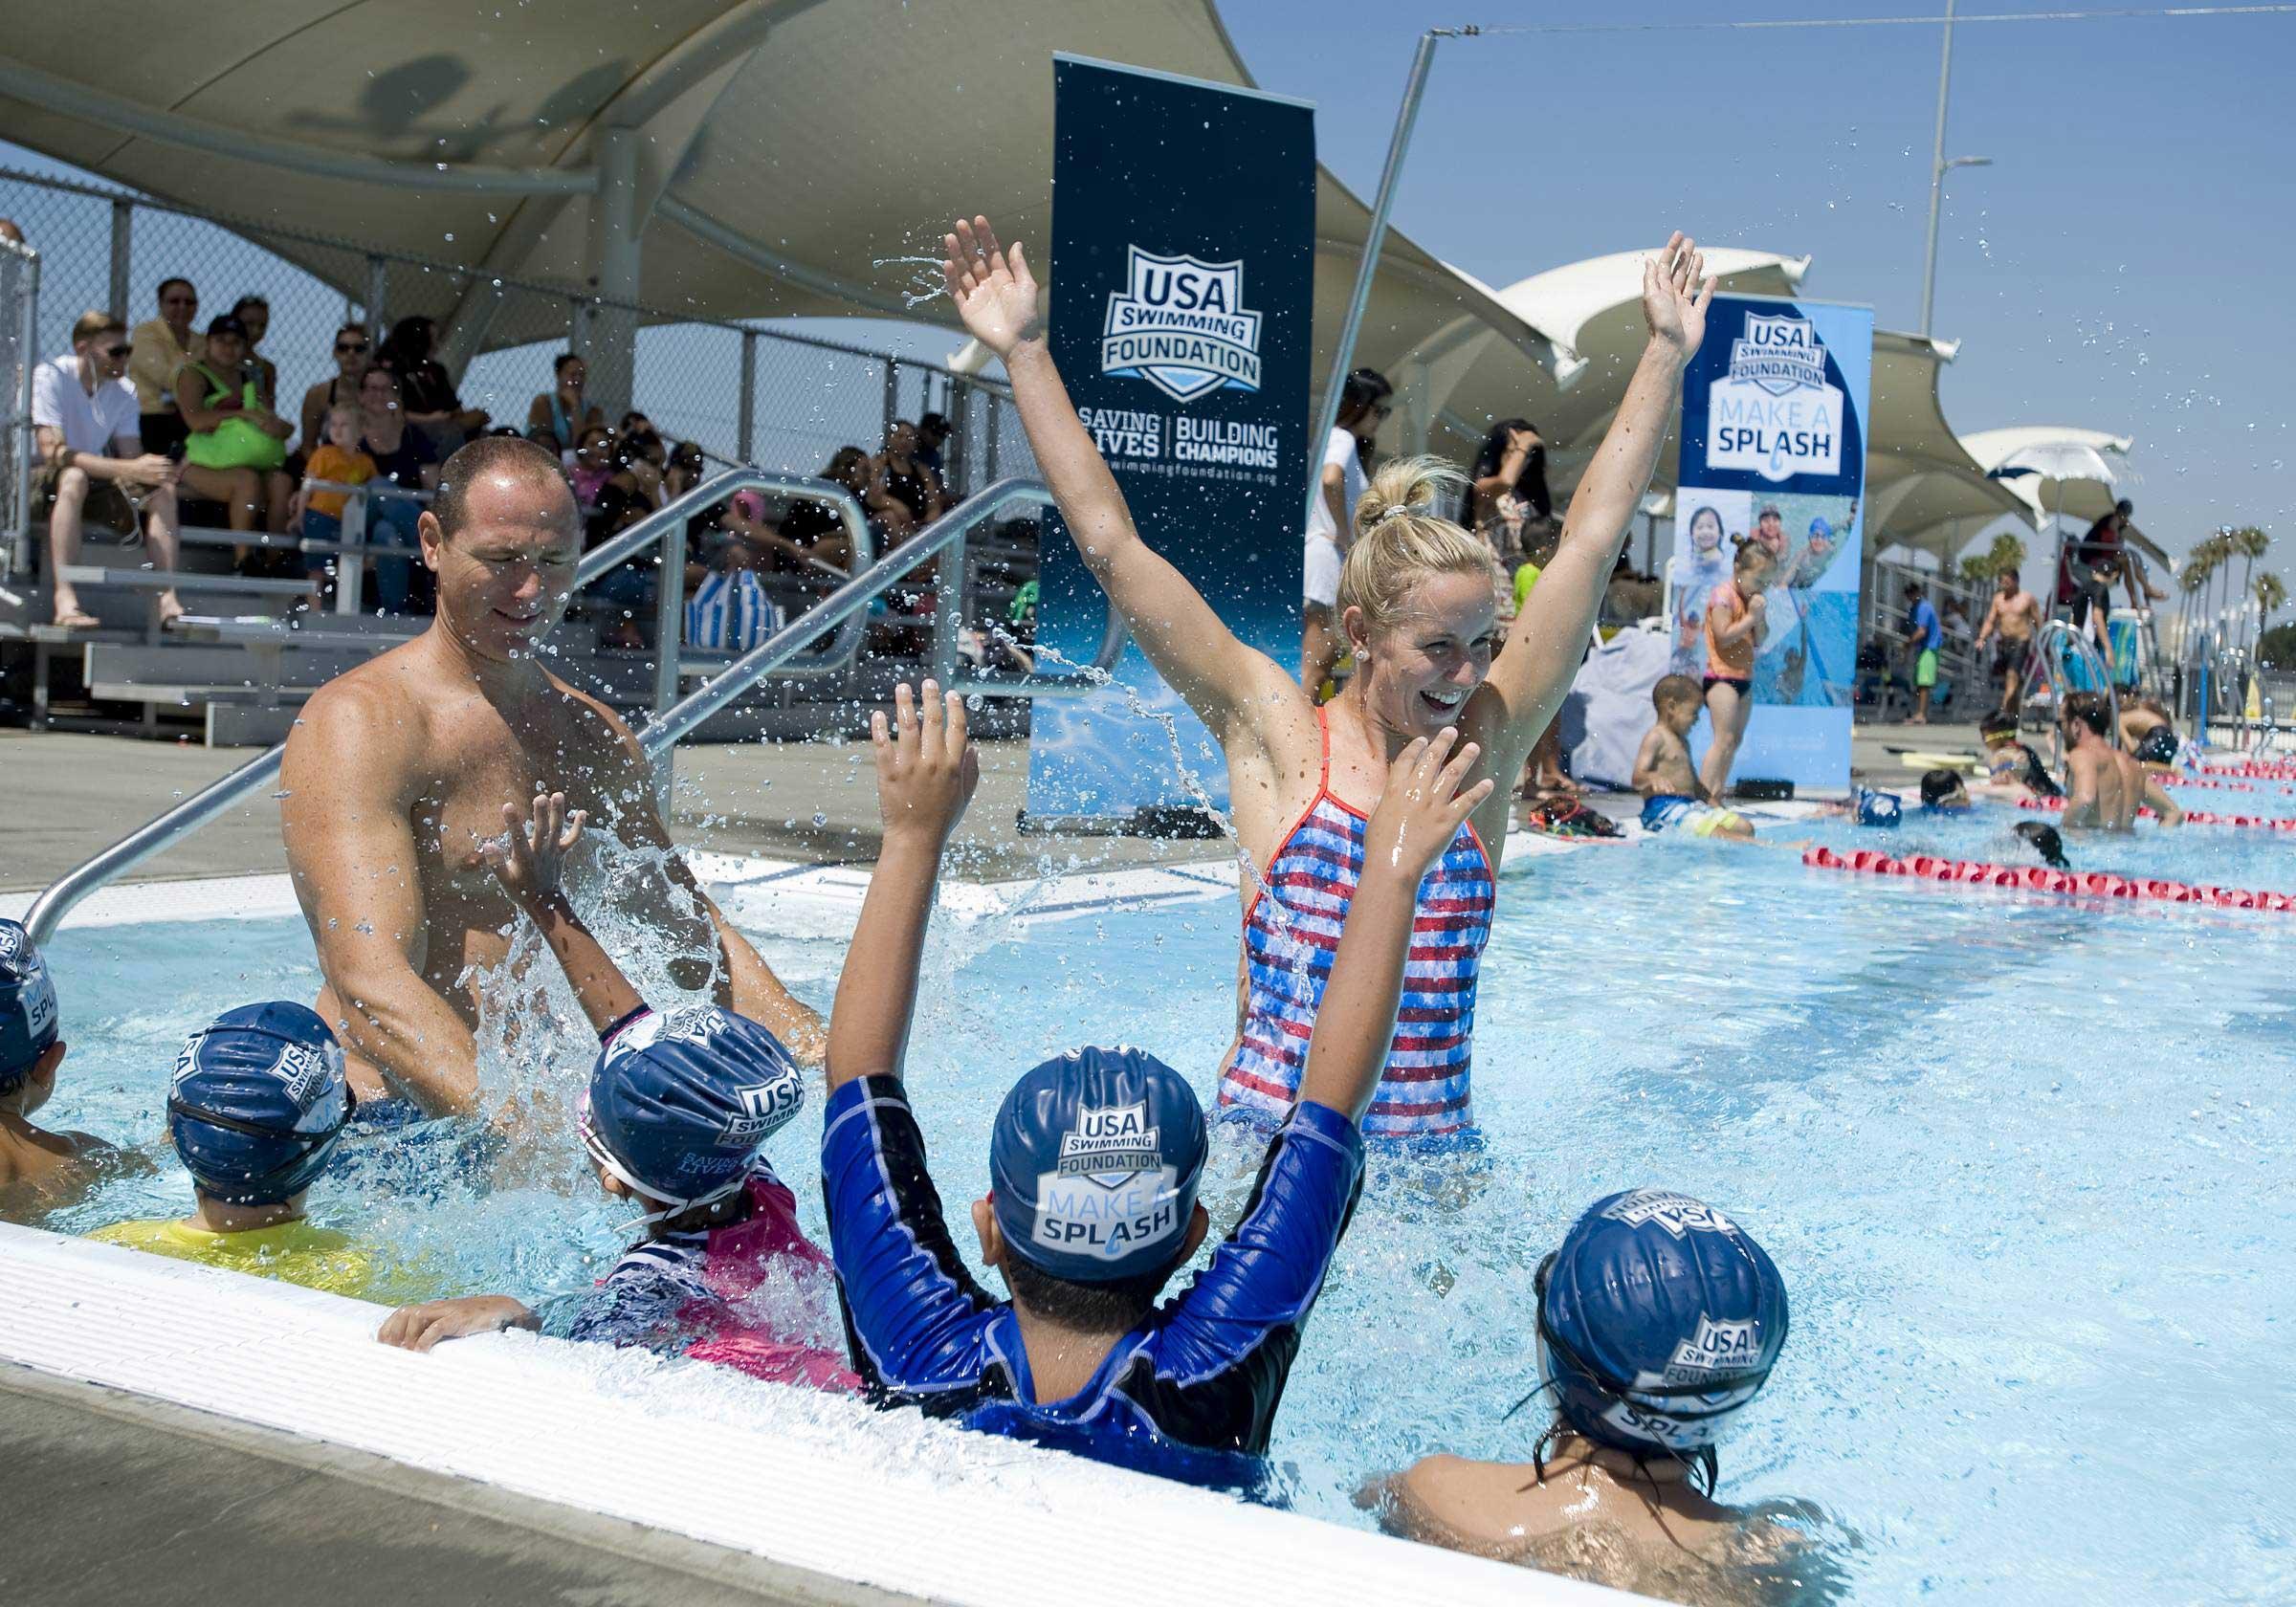 August 2, 2016, Long Beach, CA. Olympic Ambassadors Jessica Hardy and Jason Lezak kick off USA Swimming Foundation's first-ever Make a Splash Games.